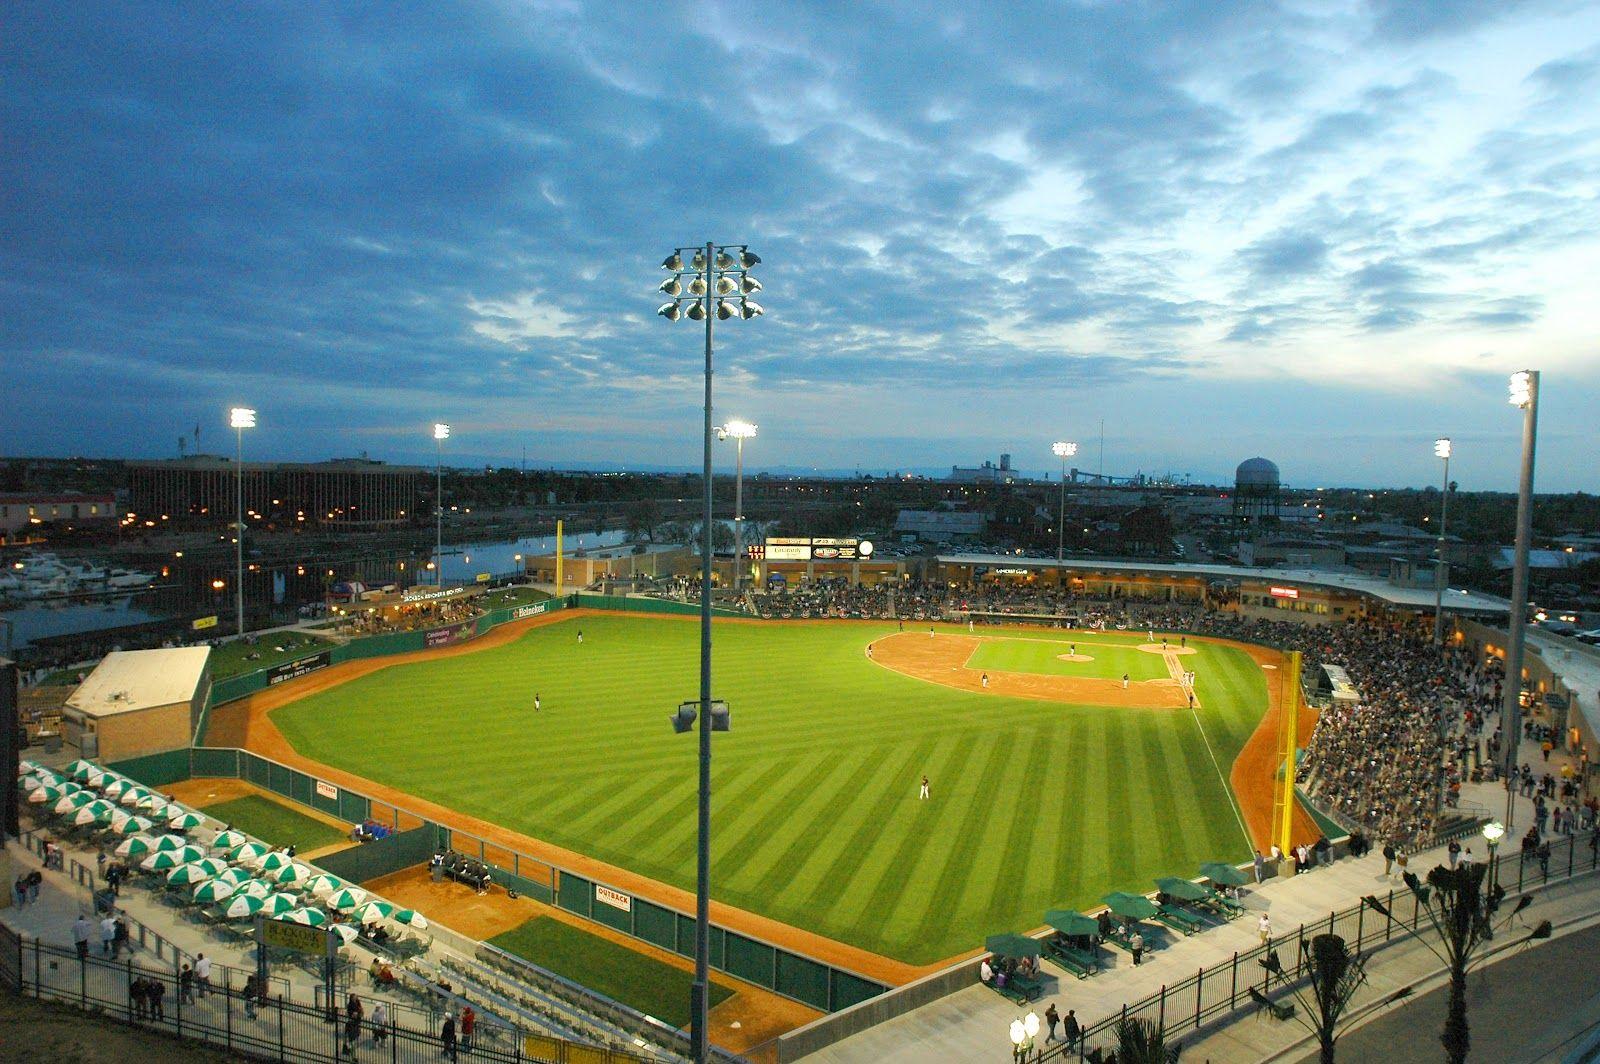 Banner Island Ballpark In Stockton California San Joaquin County Stockton Places To Go